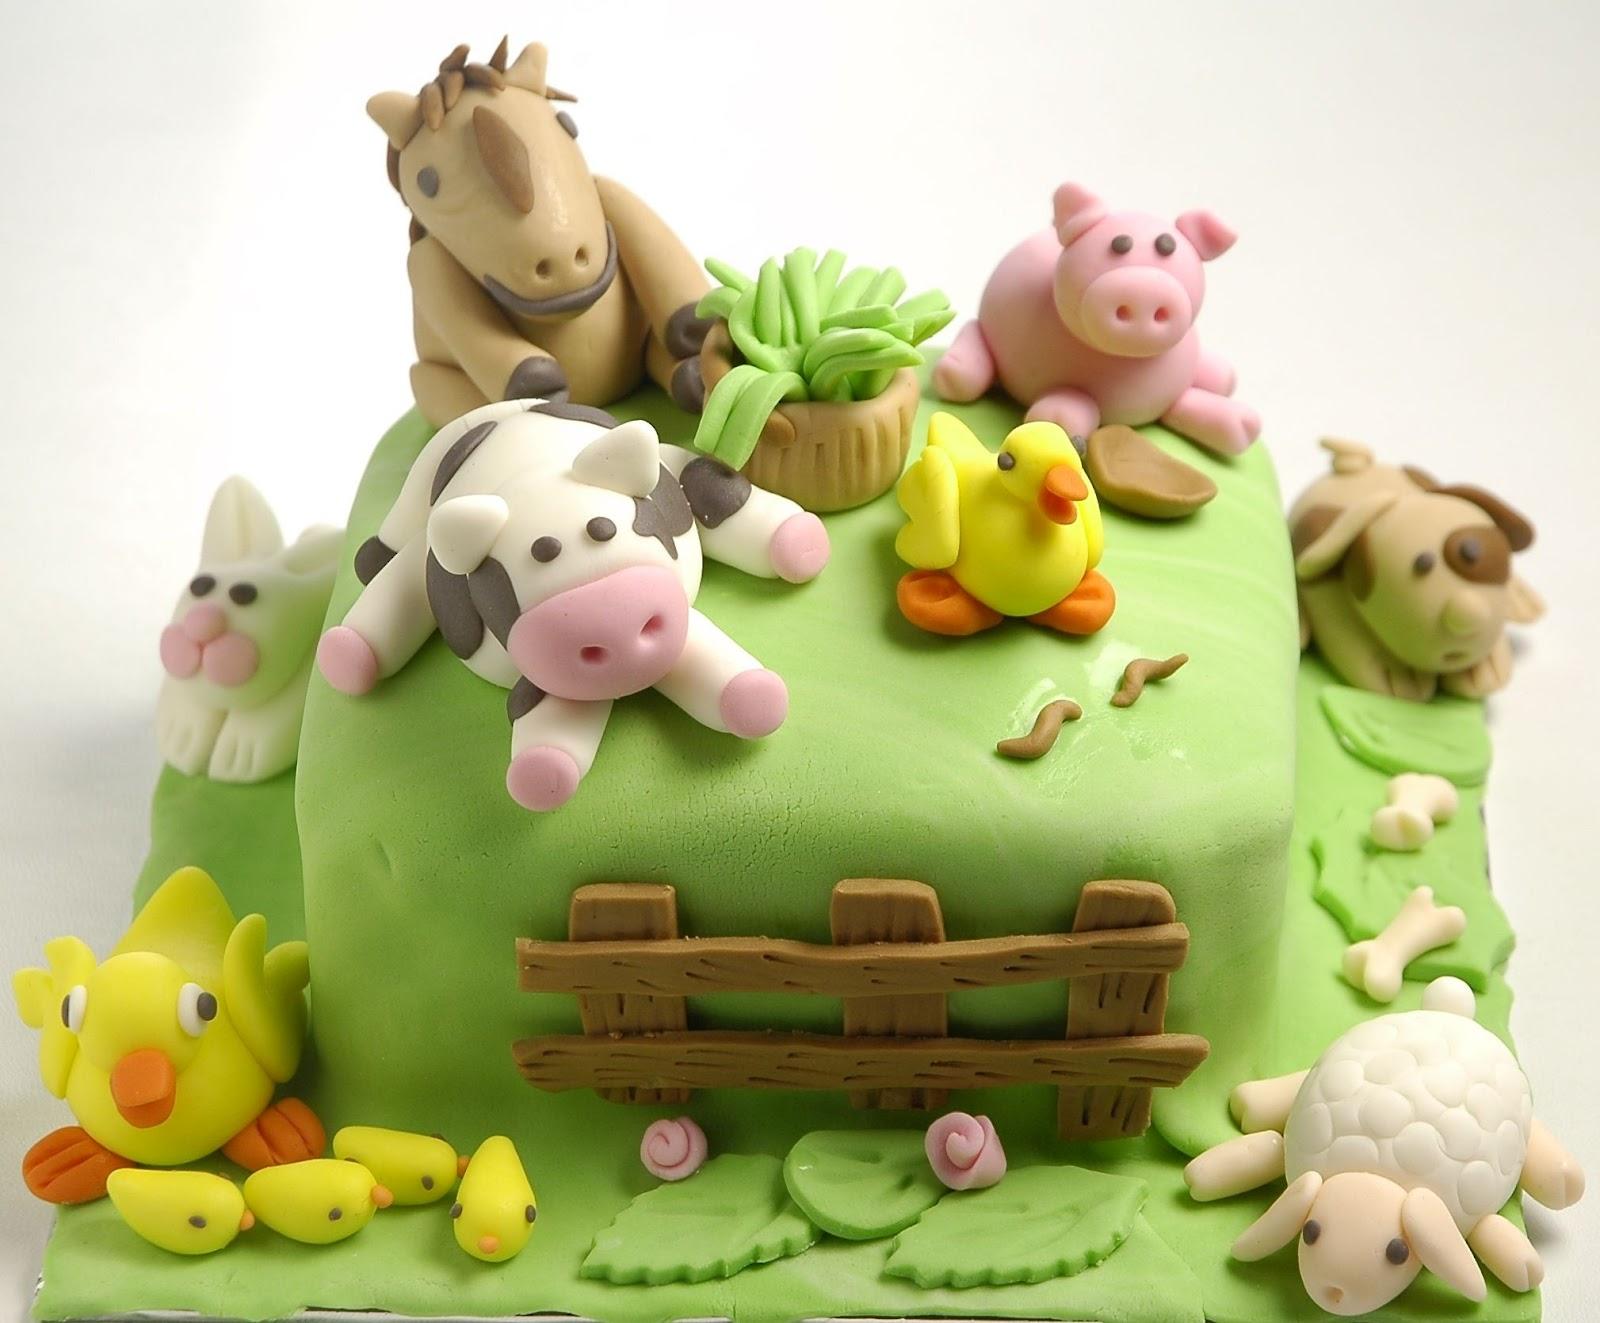 Click for details mengias kue 2c kue hias 2c cara menghias kue